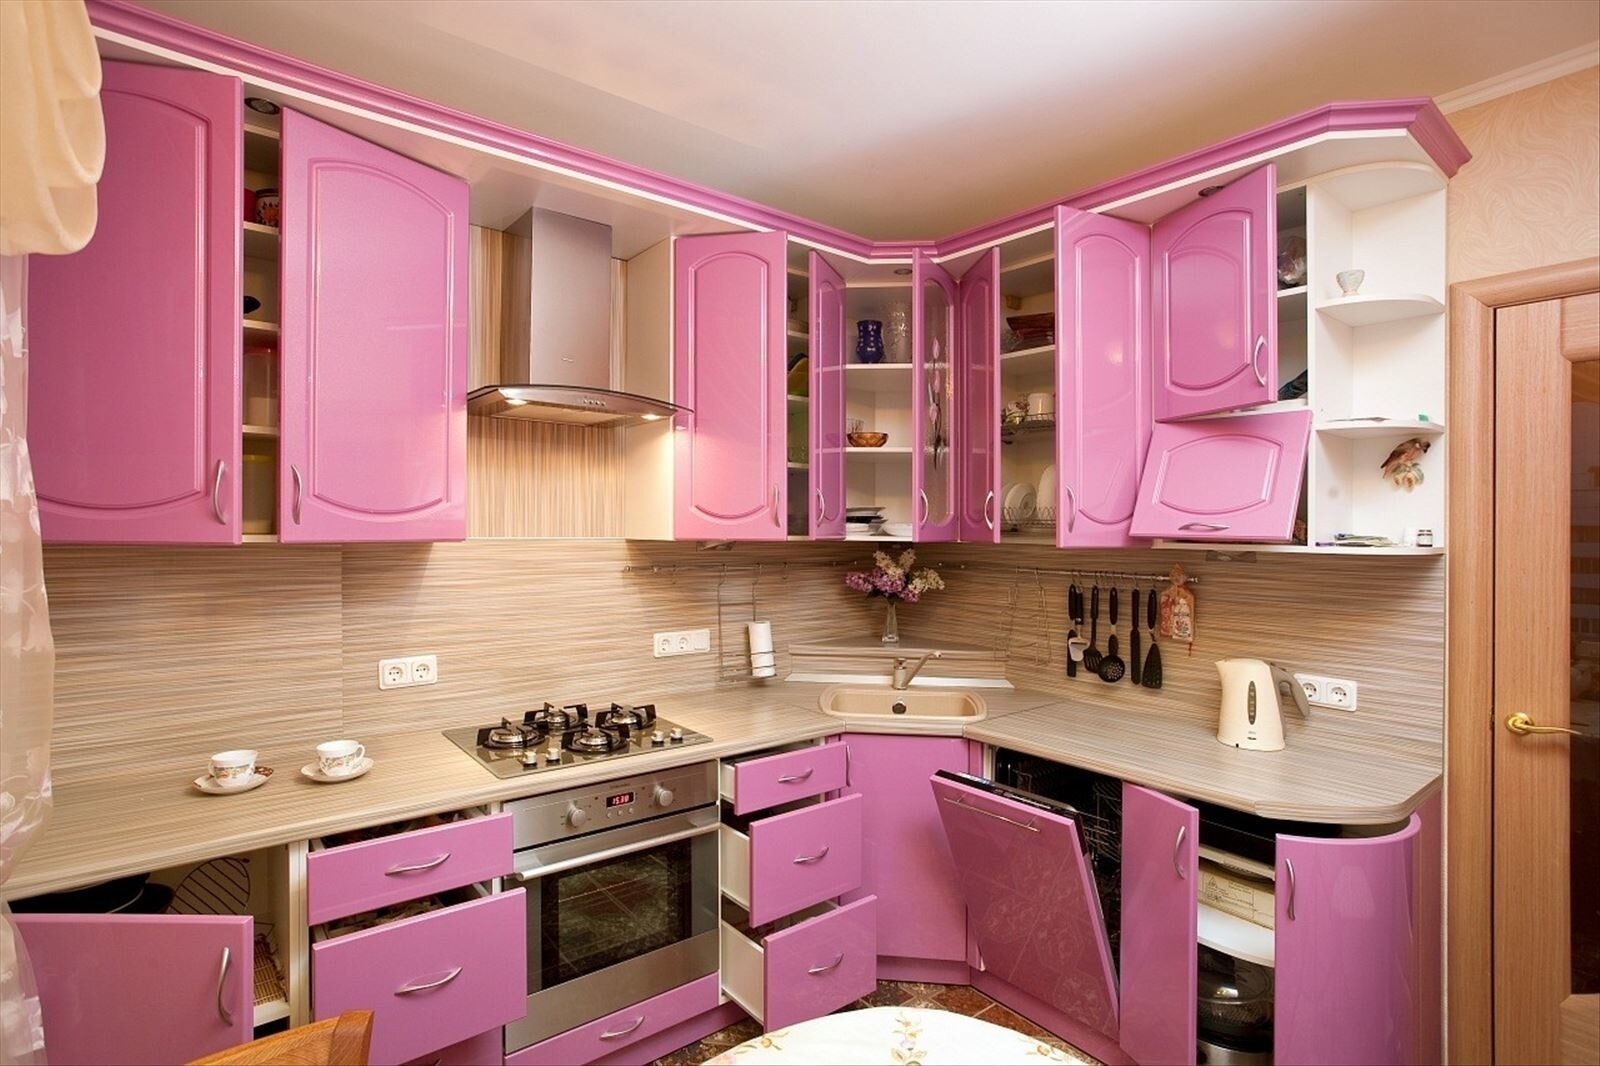 РозоваЯ кухнЯ фото.